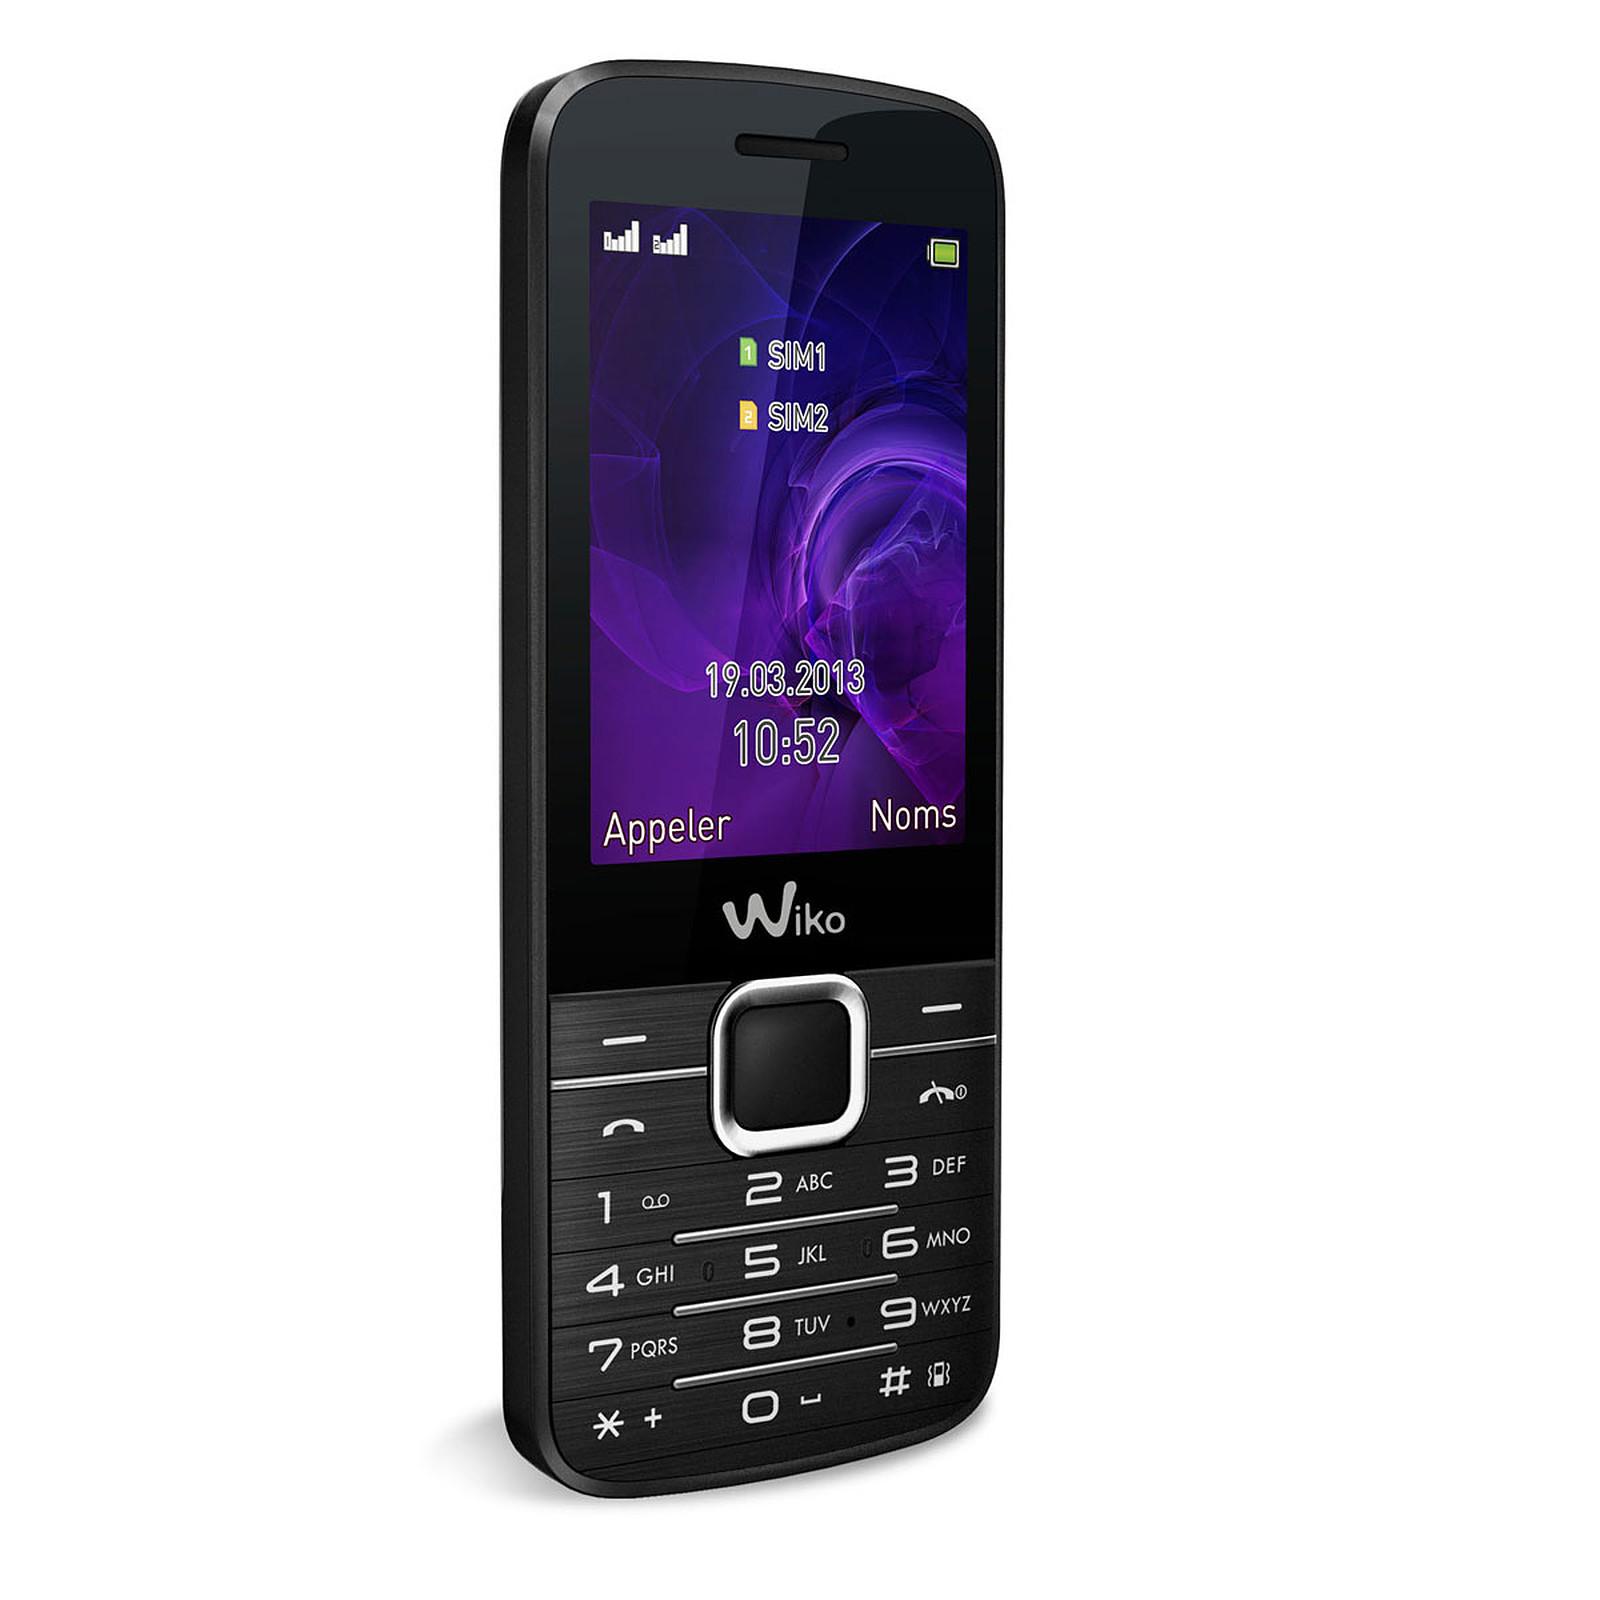 Wiko Kar 2 Noir - Mobile & smartphone Wiko sur LDLC.com   Muséericorde